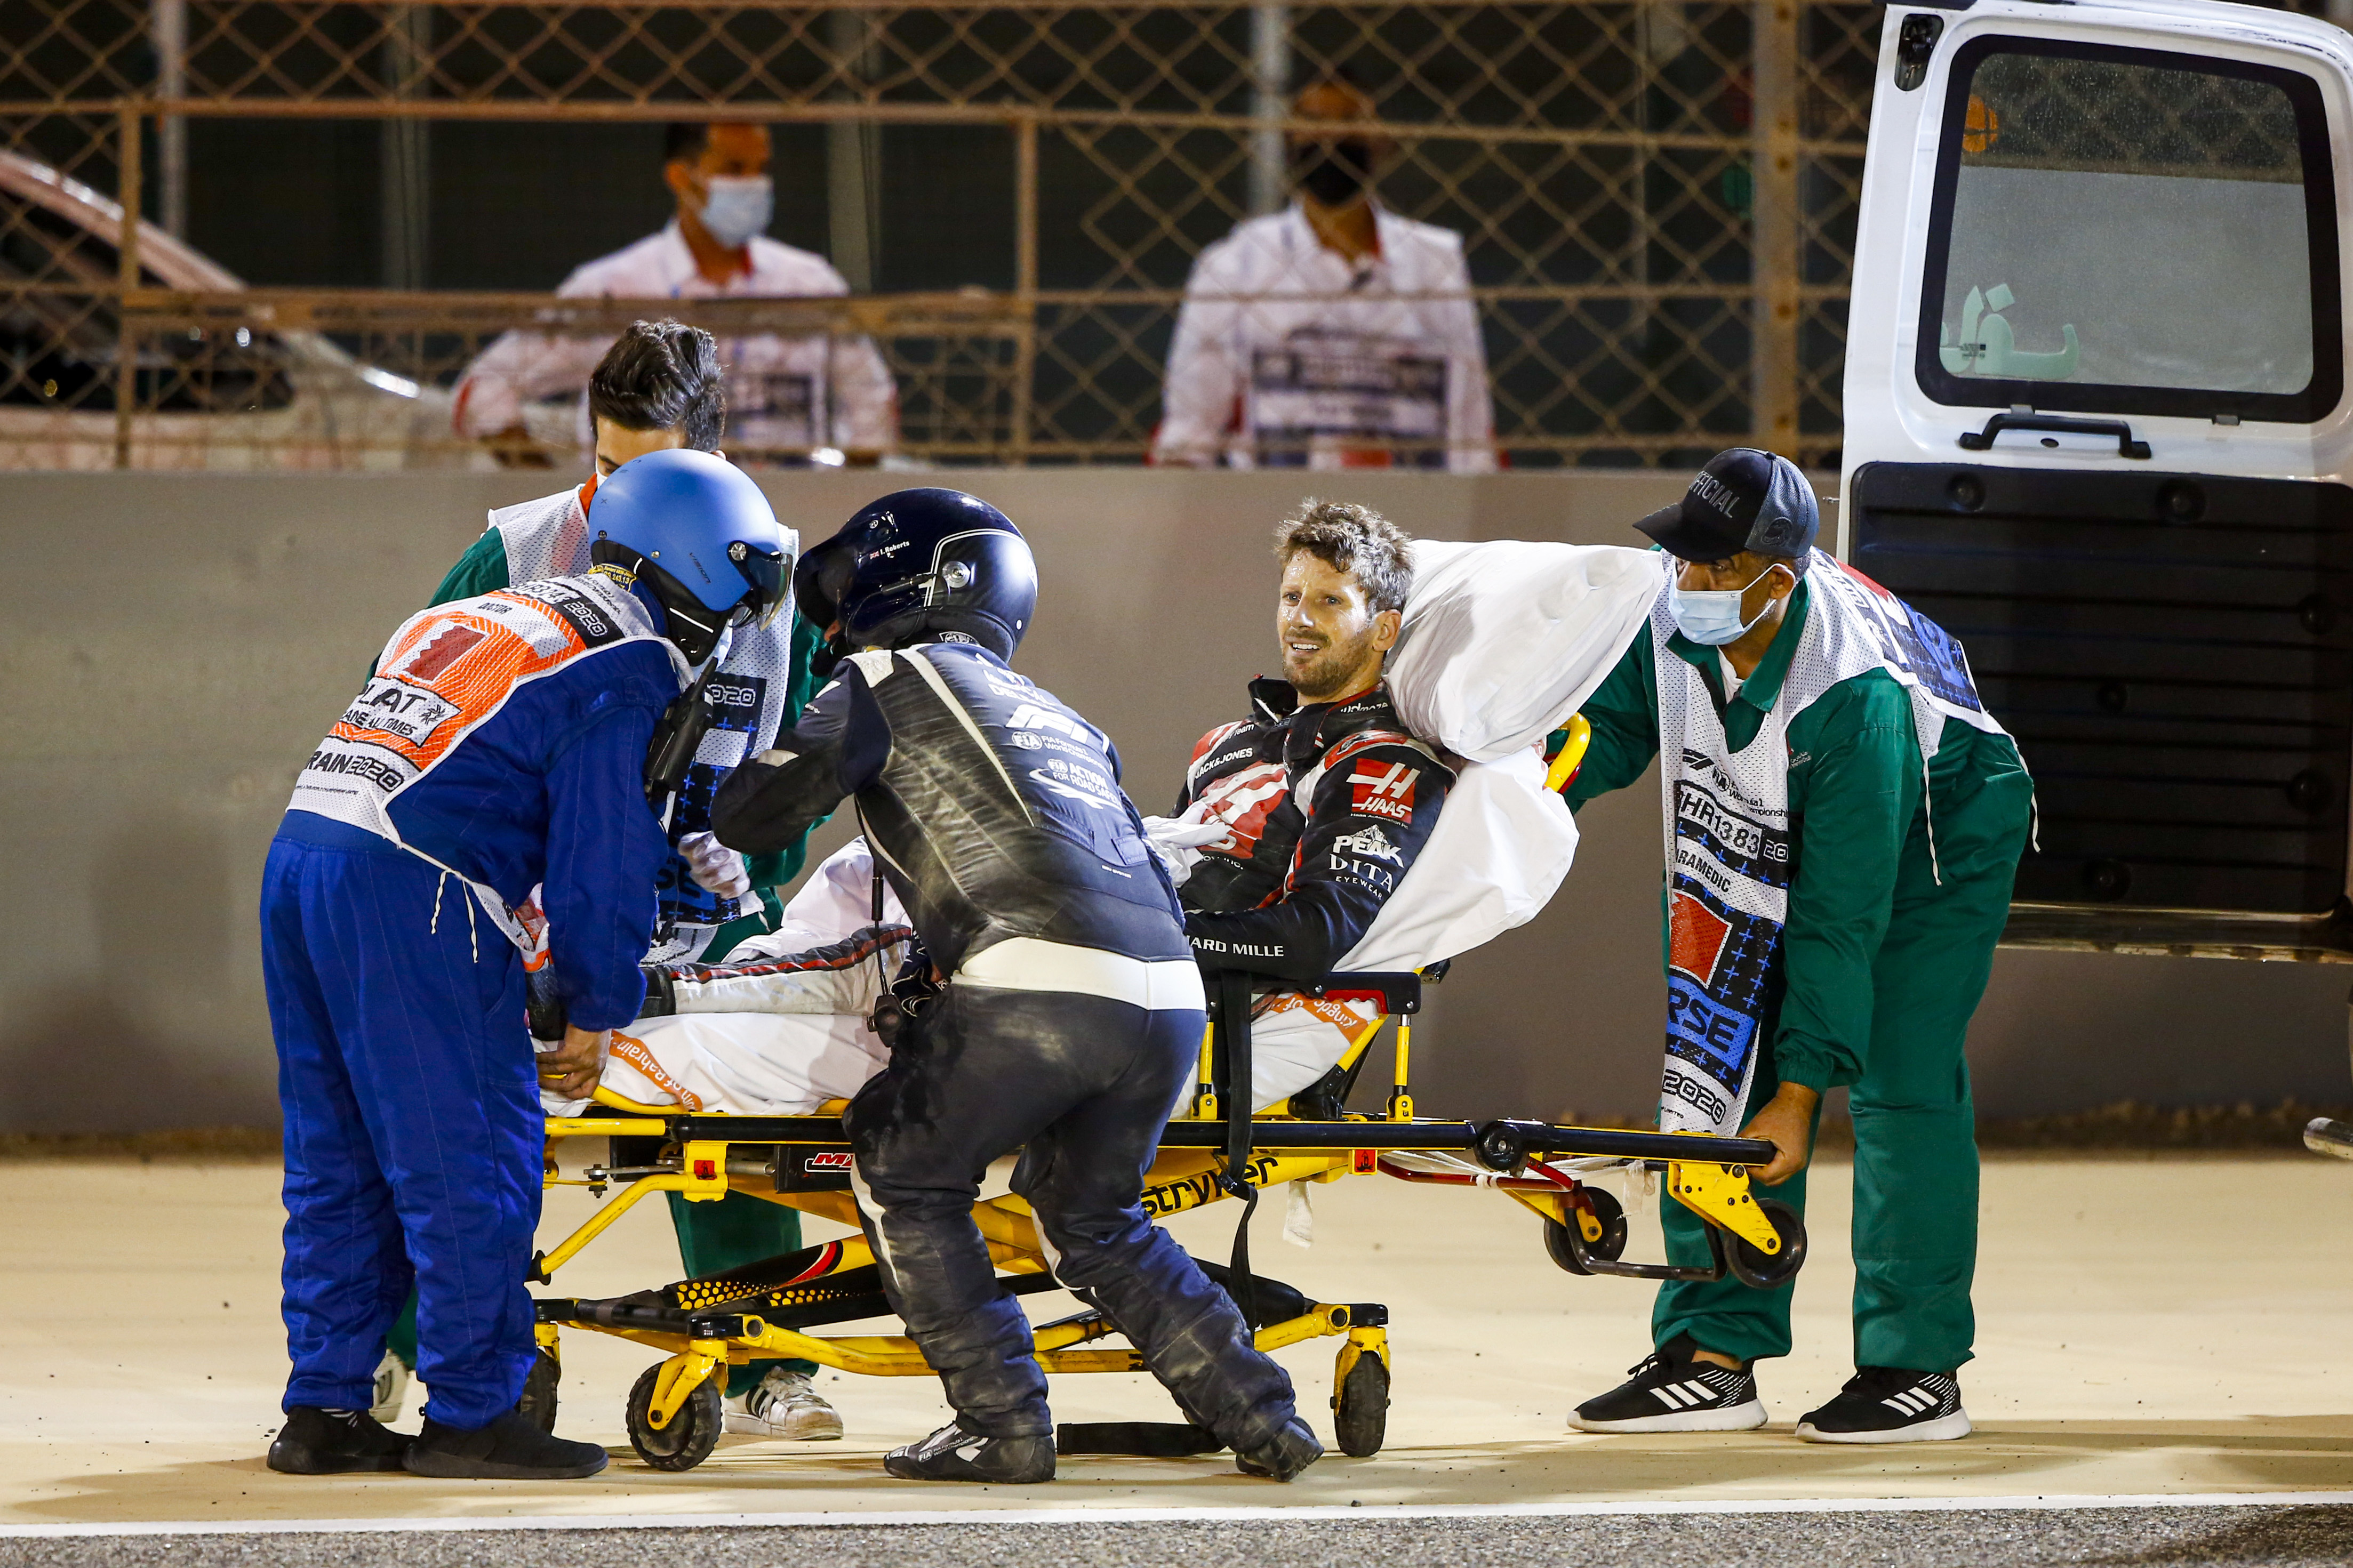 romain_ambulance-685_2.jpg